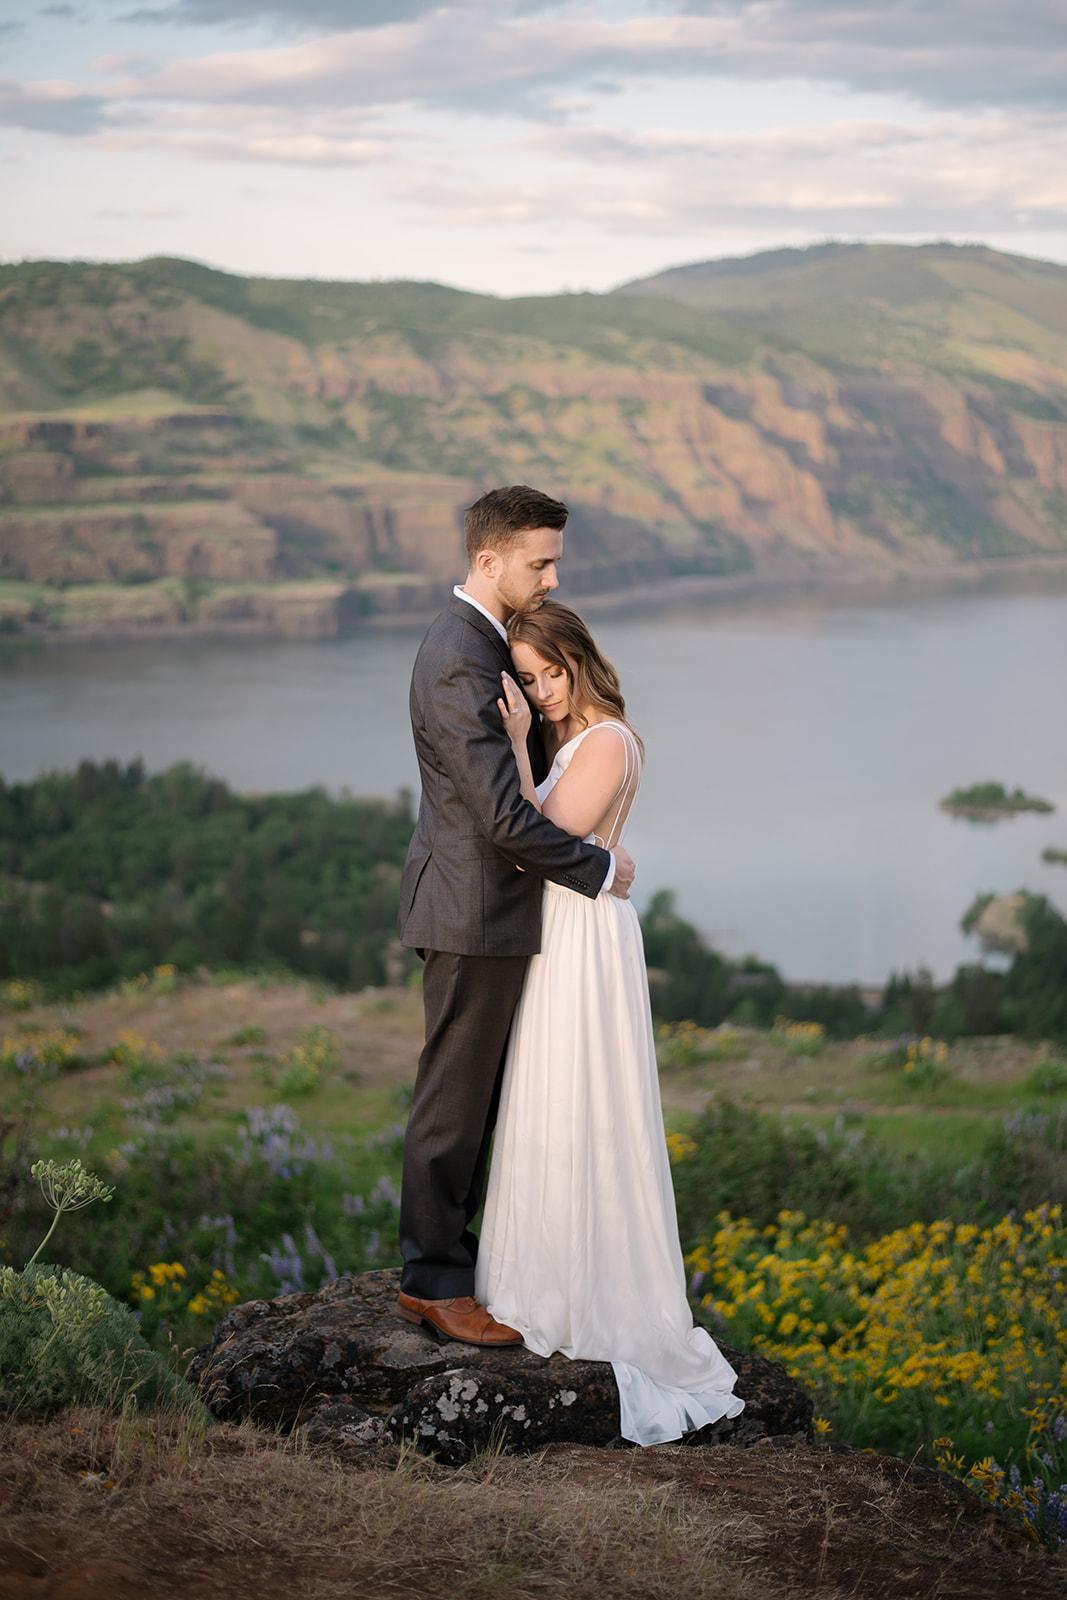 kamea_events_wedding_planner_portland_DeusAmor80.jpg